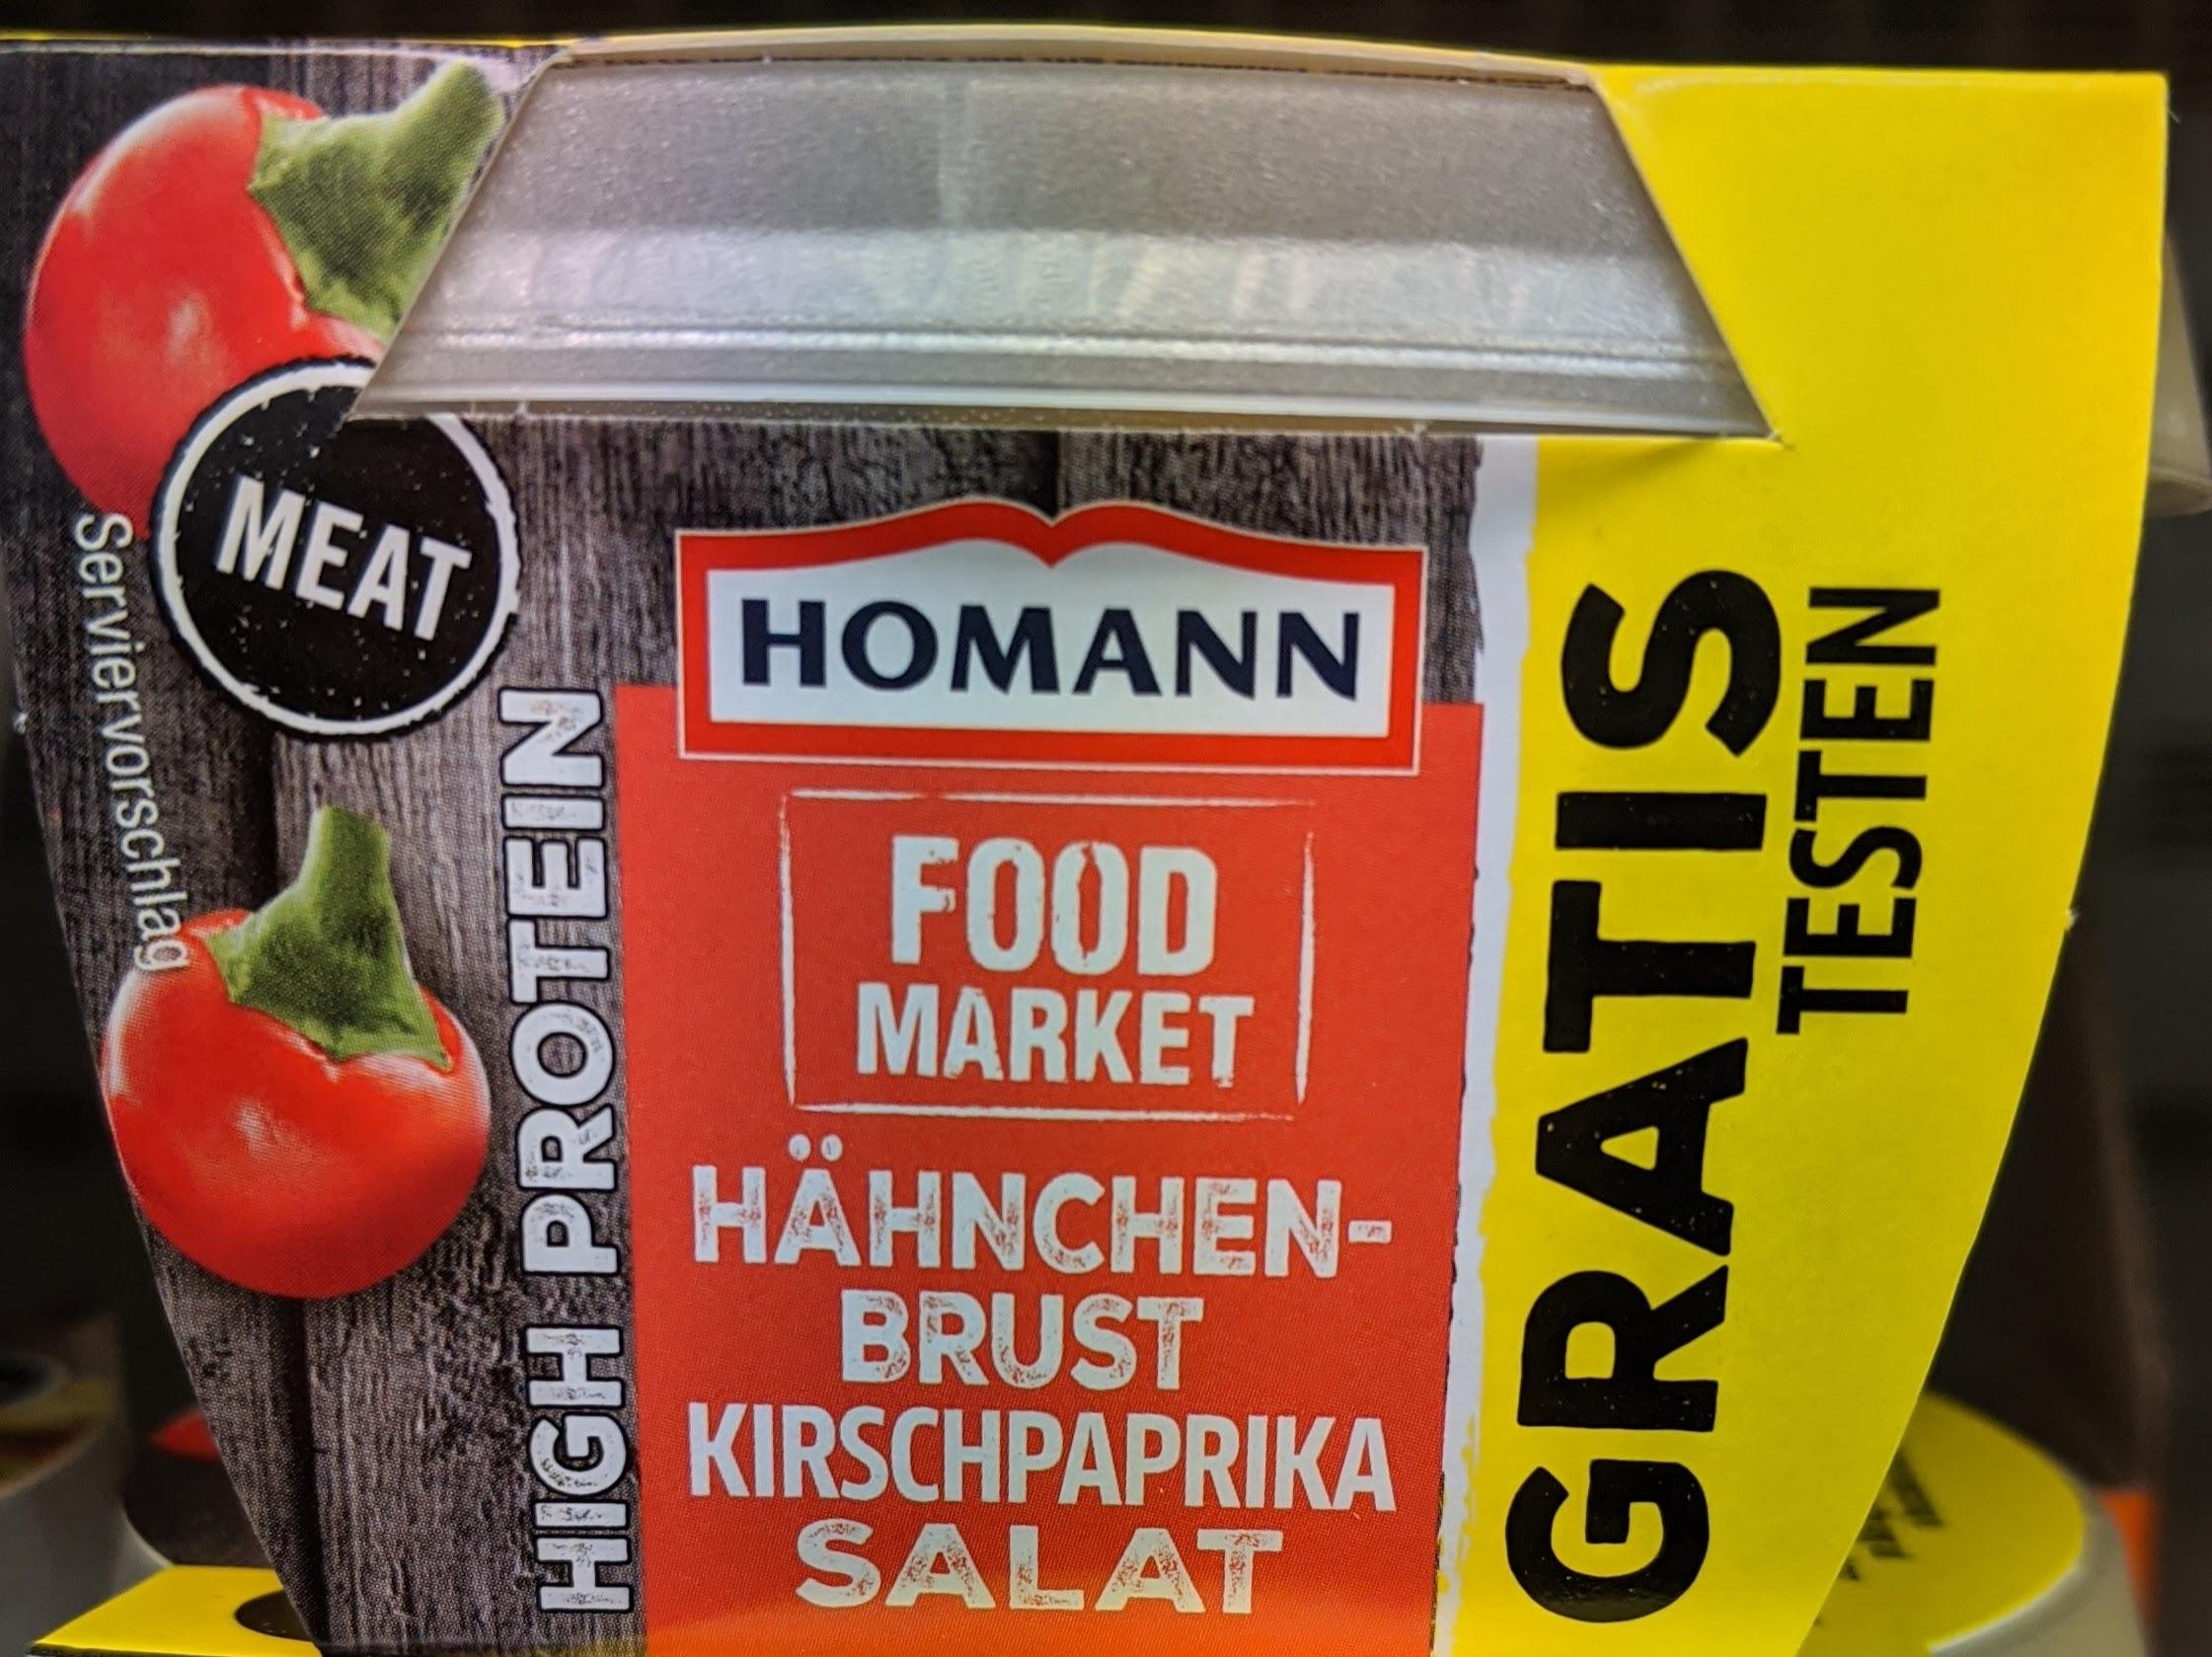 Homann Food Market Produkte Gratis Testen GzG 100% Cashback ab 01.03.2020